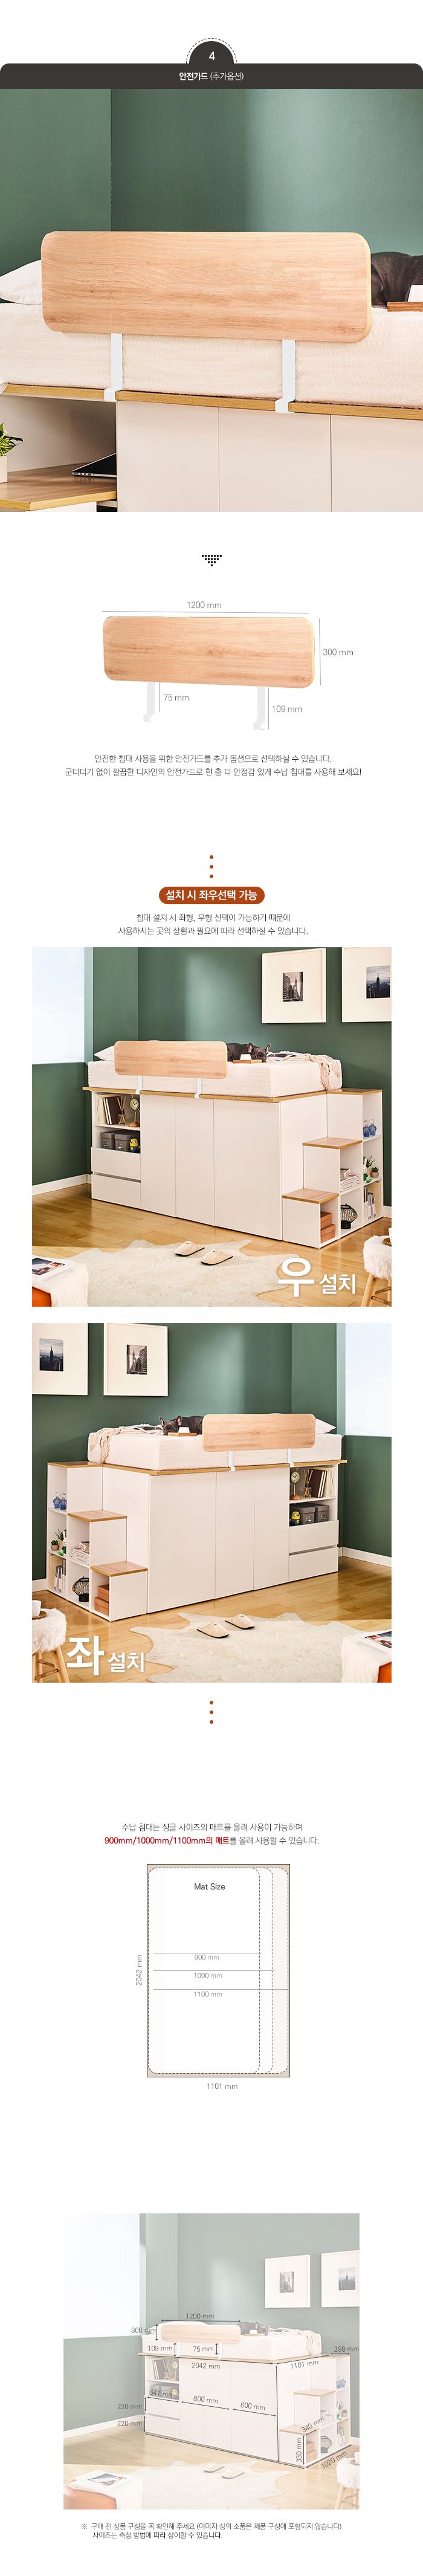 Sky-Ivy-Oak-Single-Storage-Bed_181116-3.